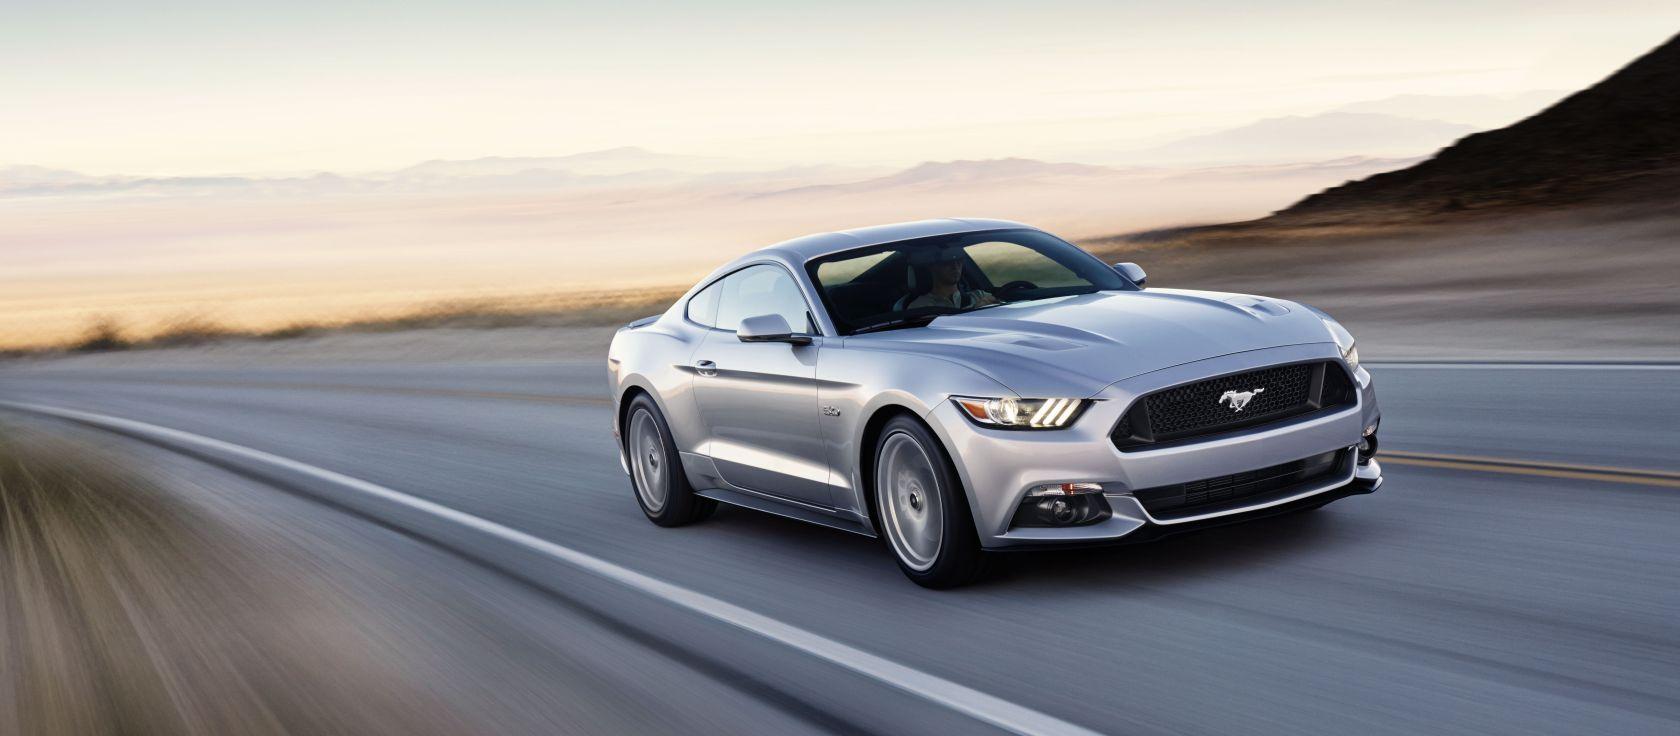 Mustang-2015-04